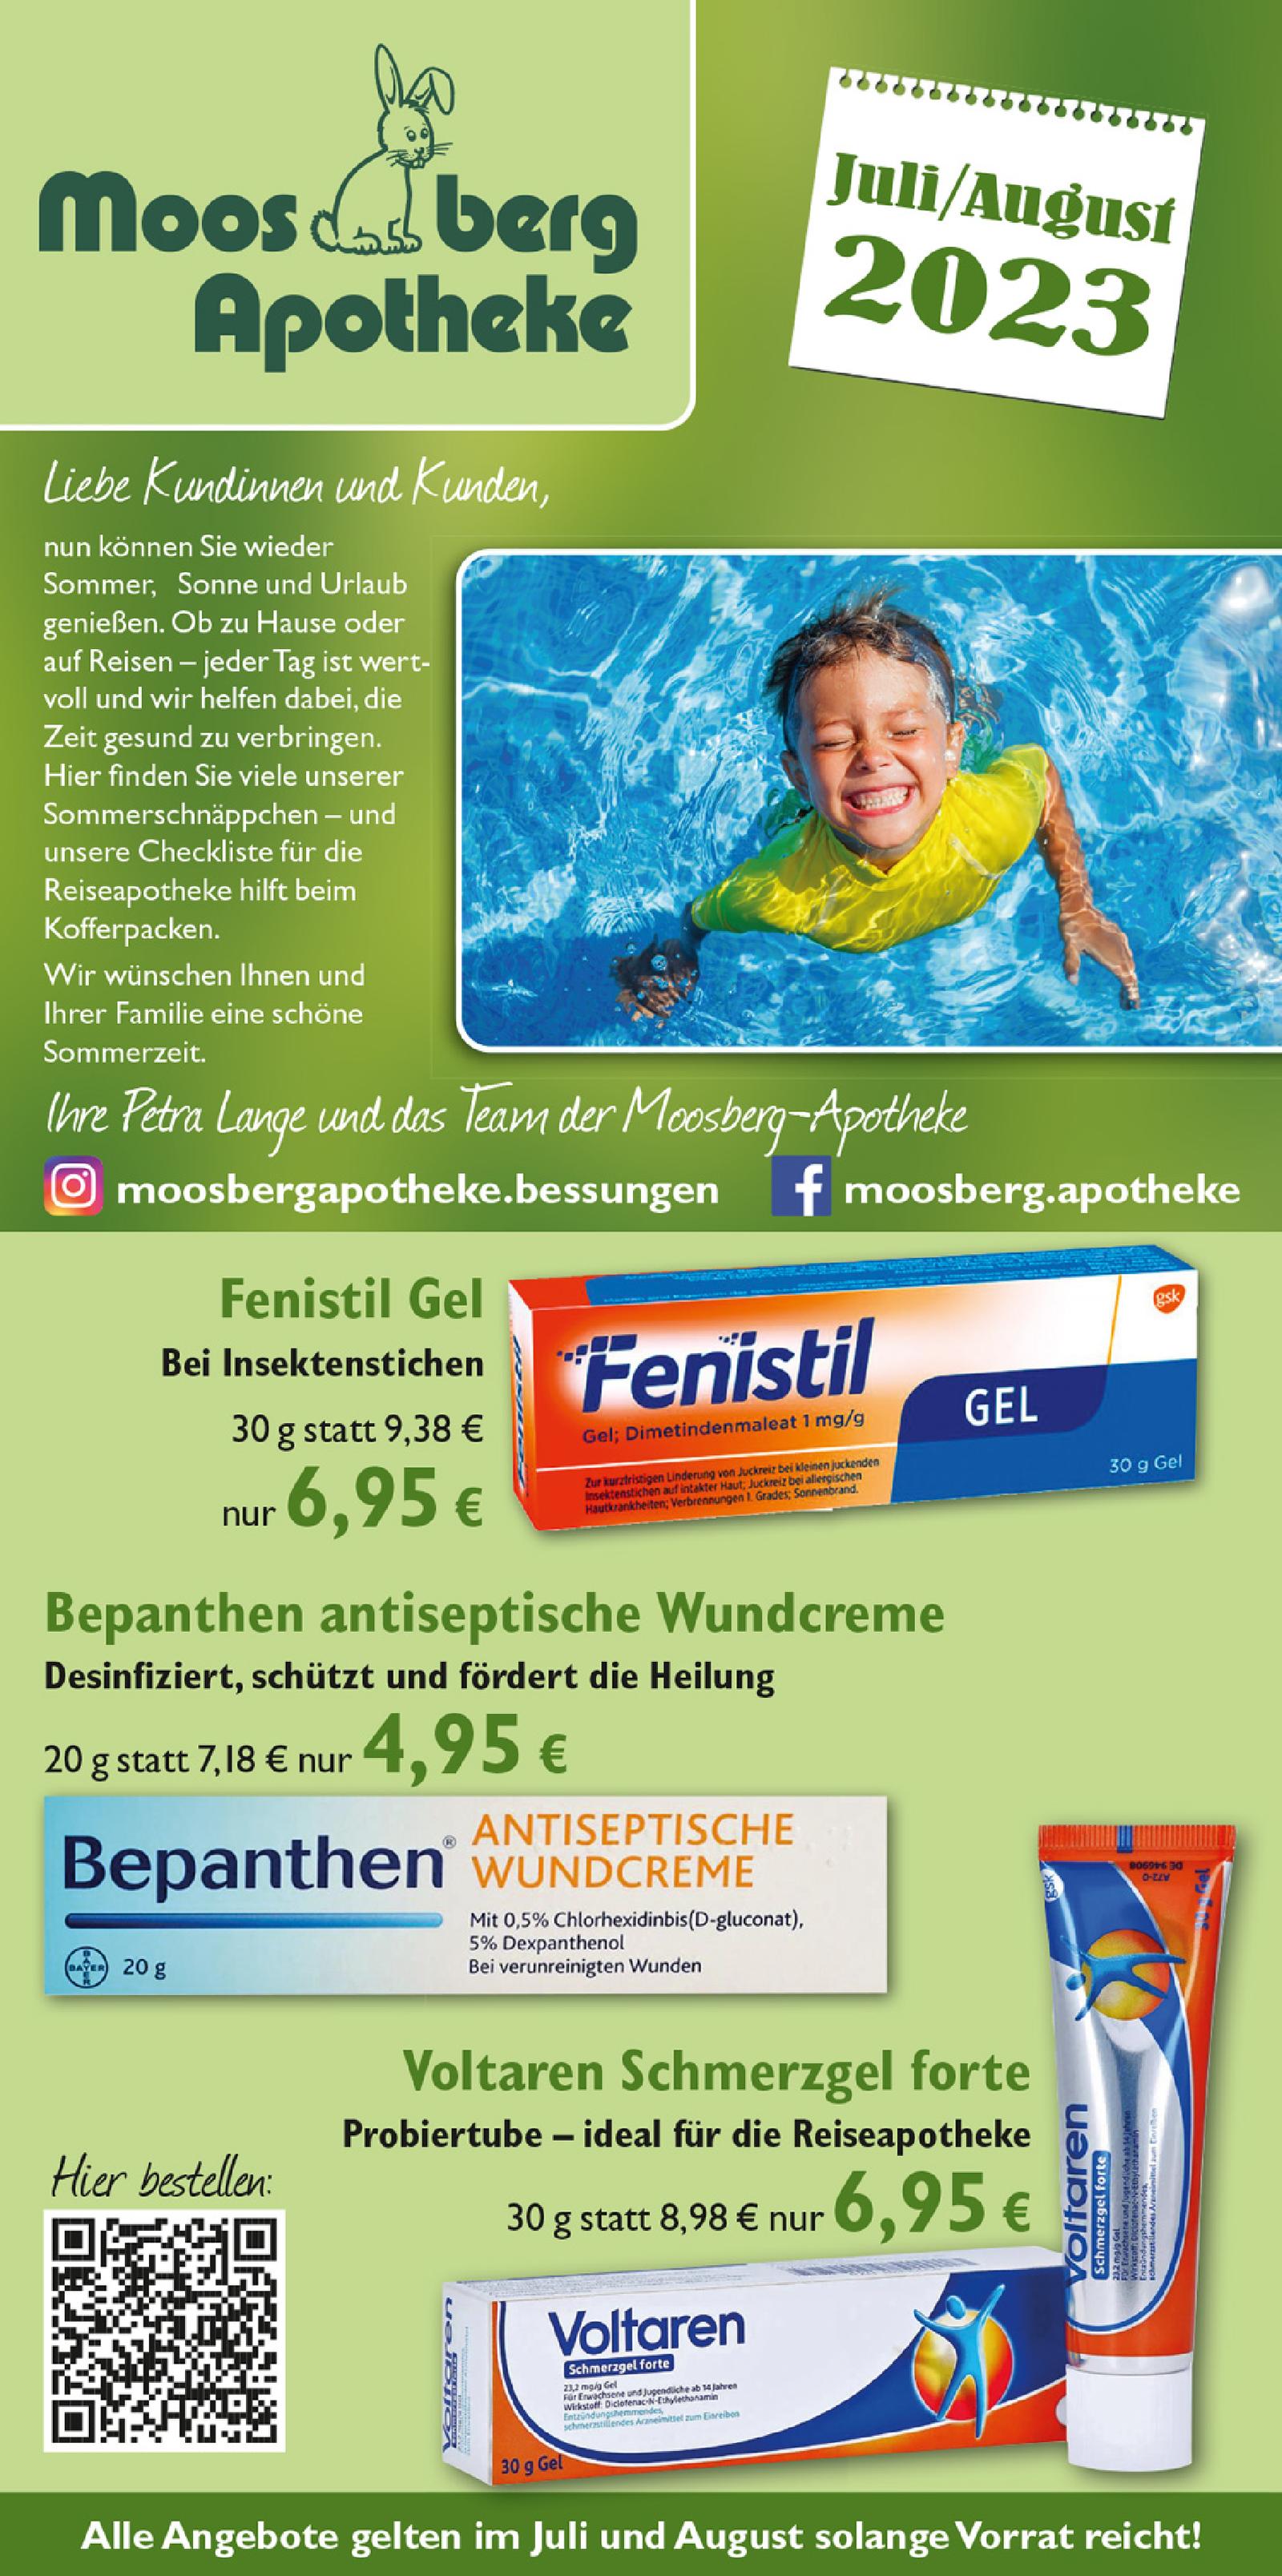 https://mein-uploads.apocdn.net/7808/leaflets/7808_flyer-Seite1.png